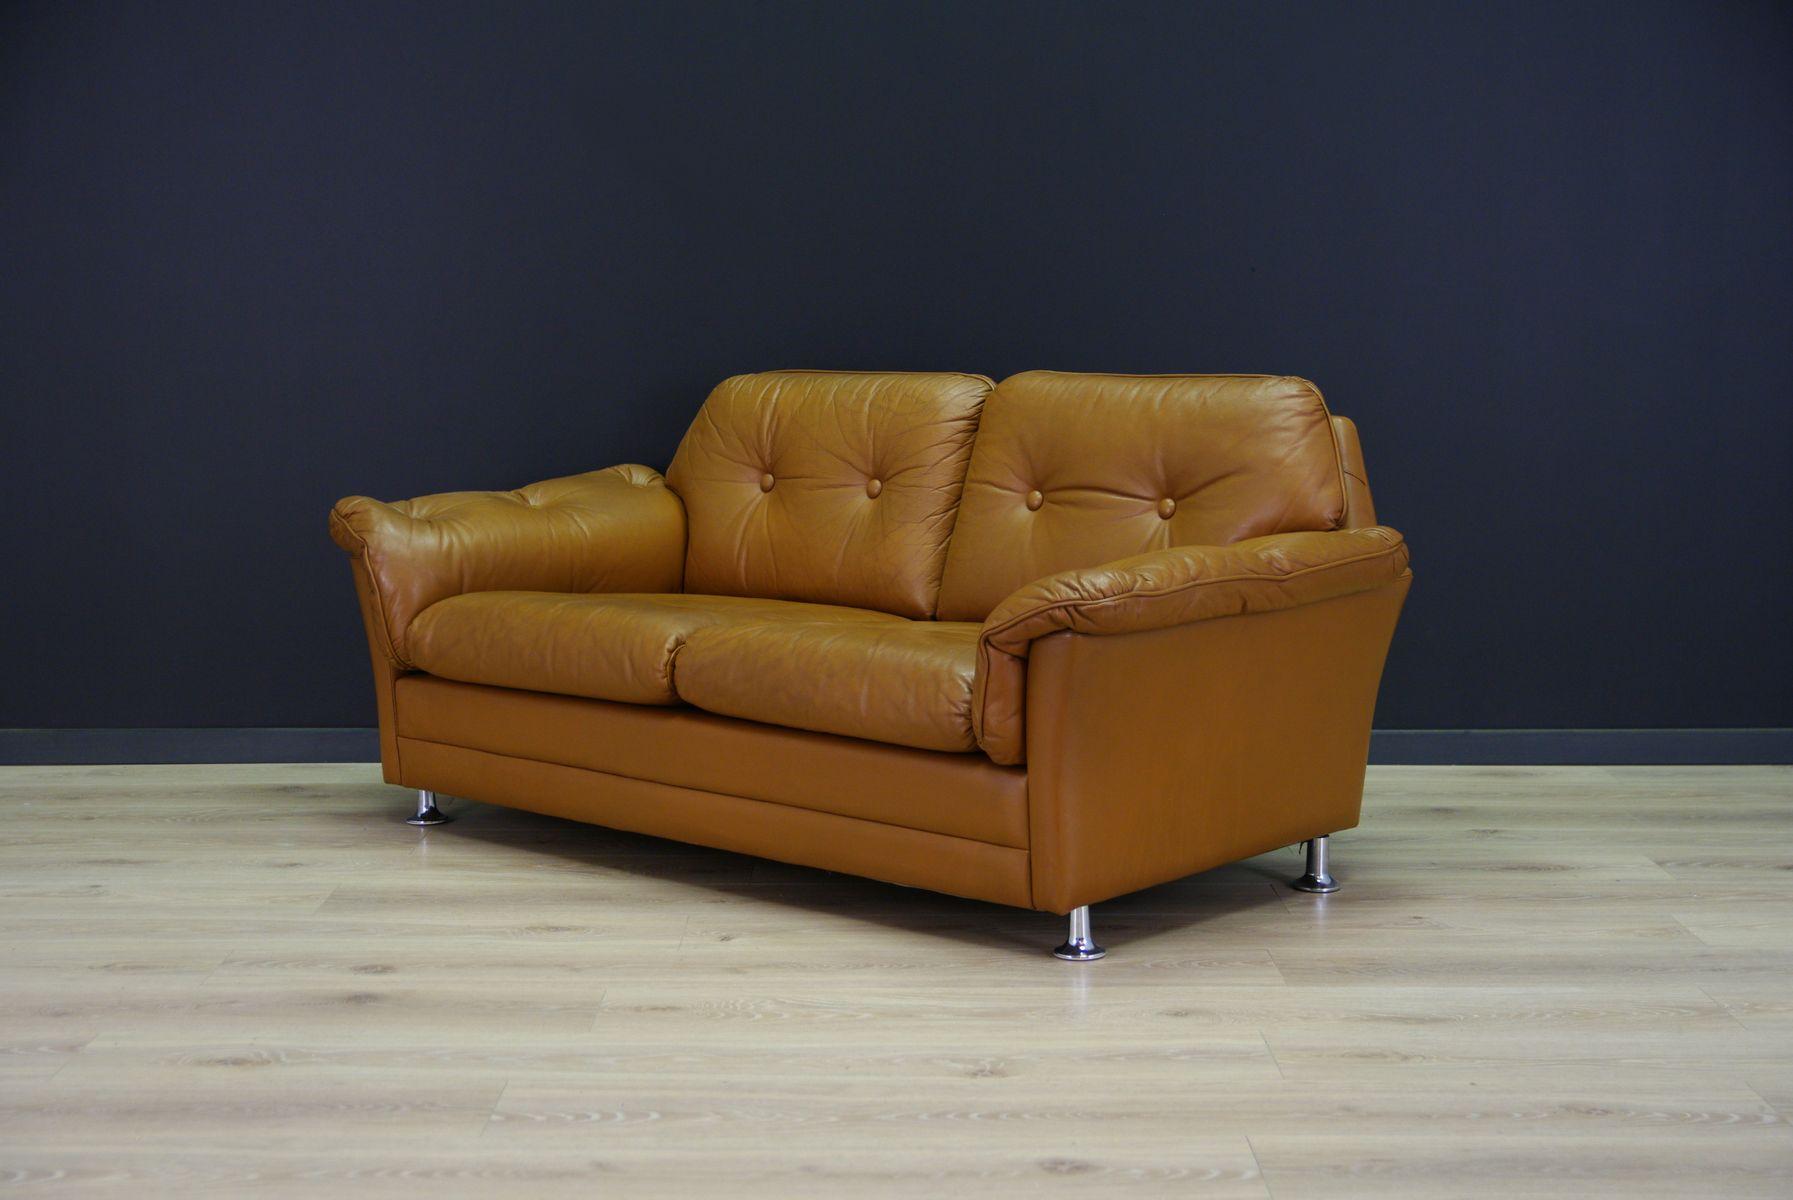 d nisches mid century ledersofa bei pamono kaufen. Black Bedroom Furniture Sets. Home Design Ideas